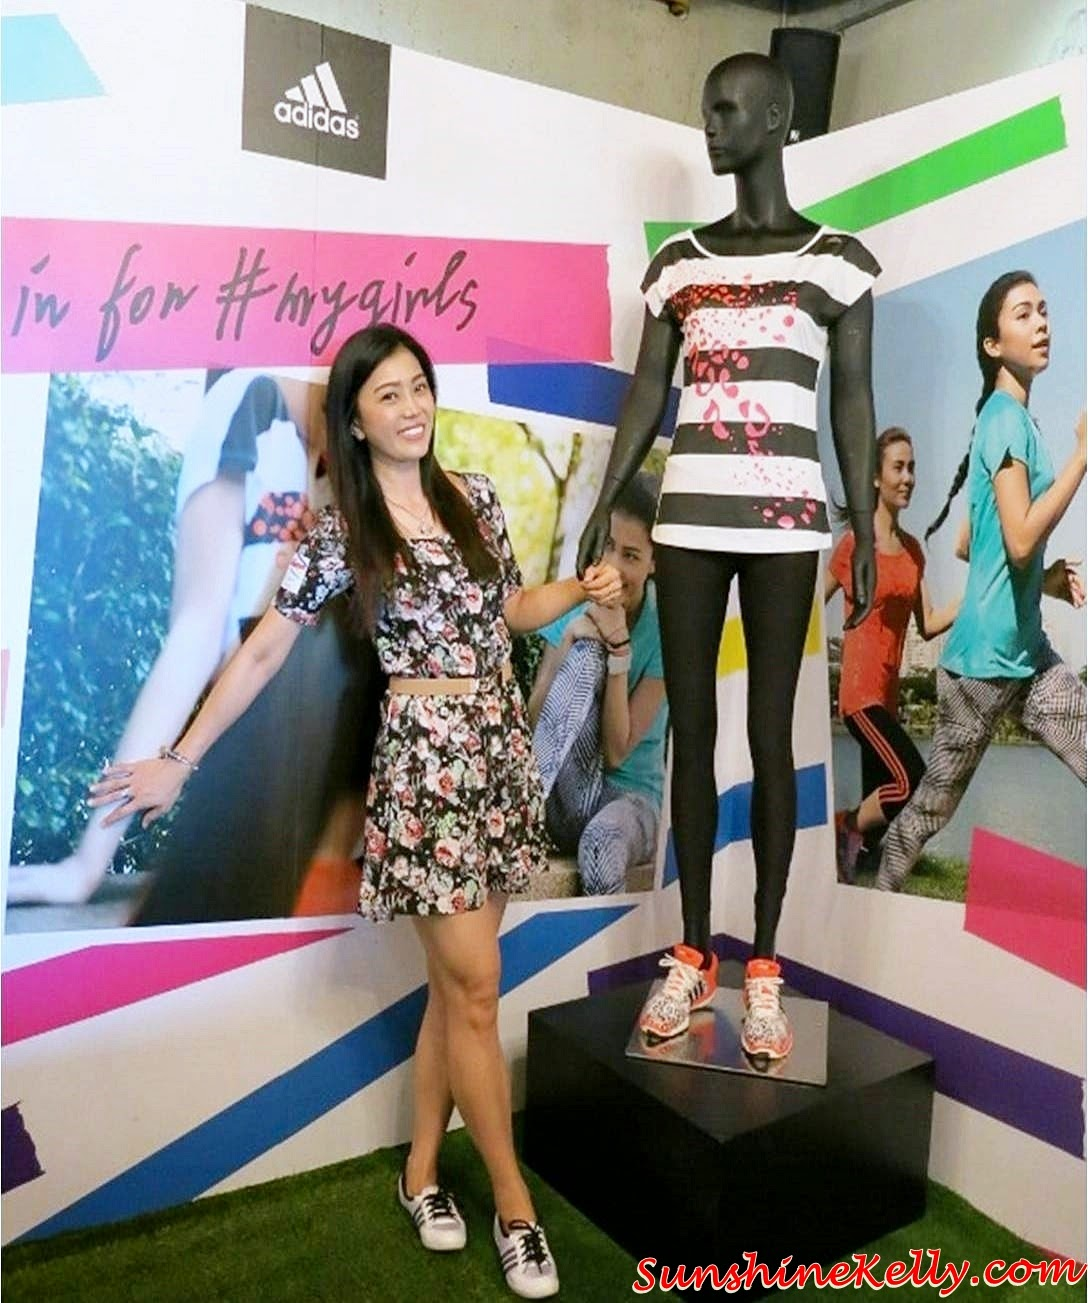 adidas #mygirls, adidas Women's Sports Performance Fall Winter 2014 Collection, adidas women sports, adidas women, adidas mygirls campaign, mygirls, sharifah sakinah, Atilia Haron, Sazzy Falak, Megan Tan, Elfira Loy